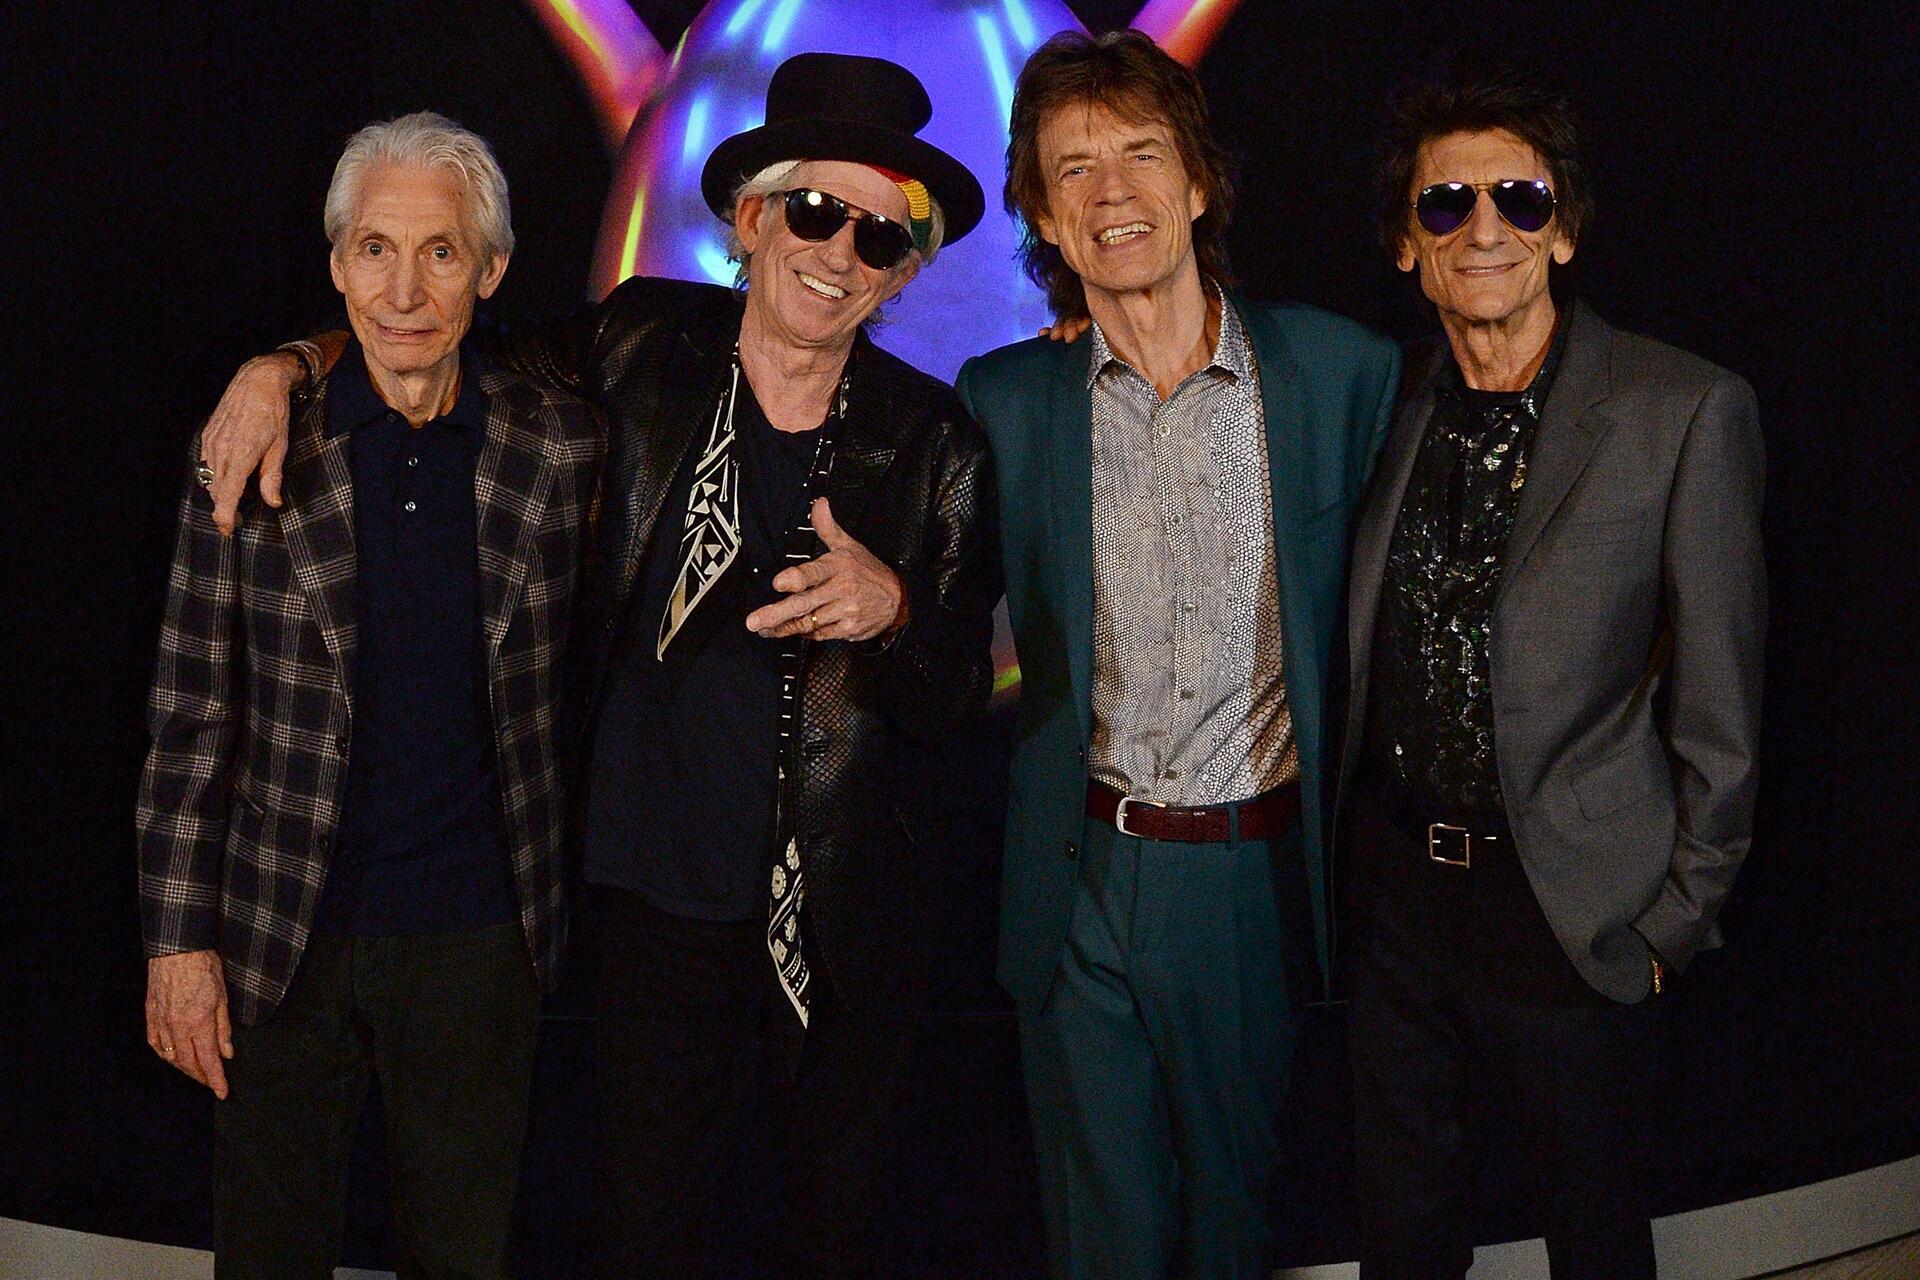 Bild zu Charlie Watts, Keith Richards, Mick Jagger, Ronnie Wood, Rolling Stones, Album